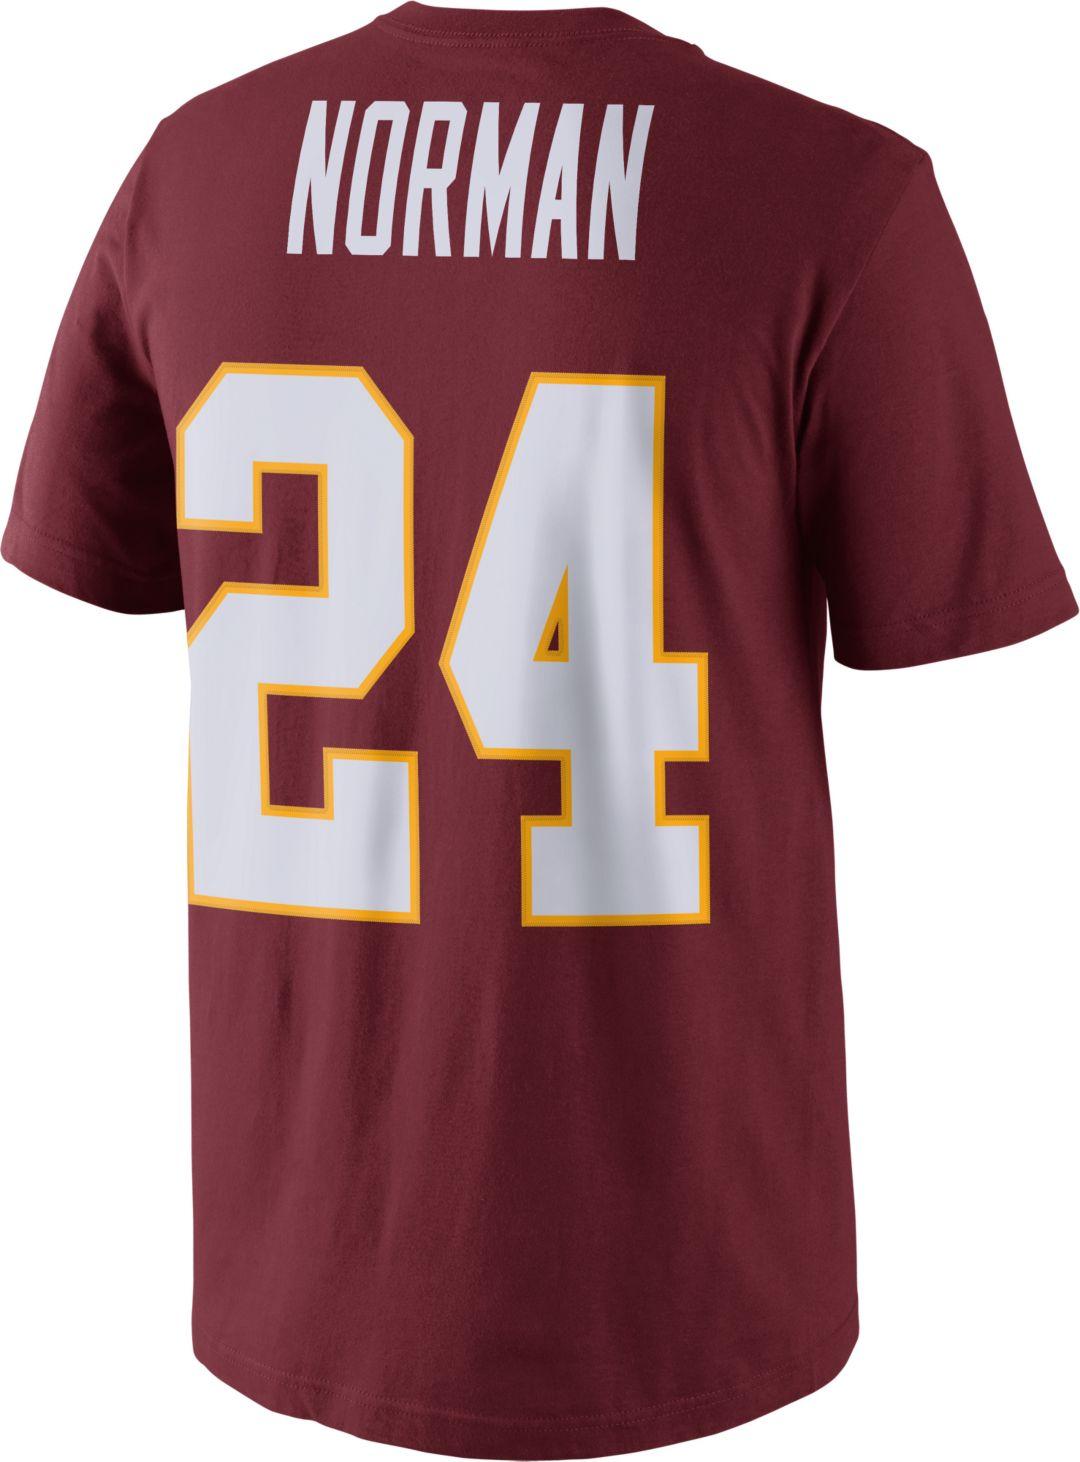 18a74c54 Nike Men's Washington Redskins Josh Norman #24 Pride Red T-Shirt